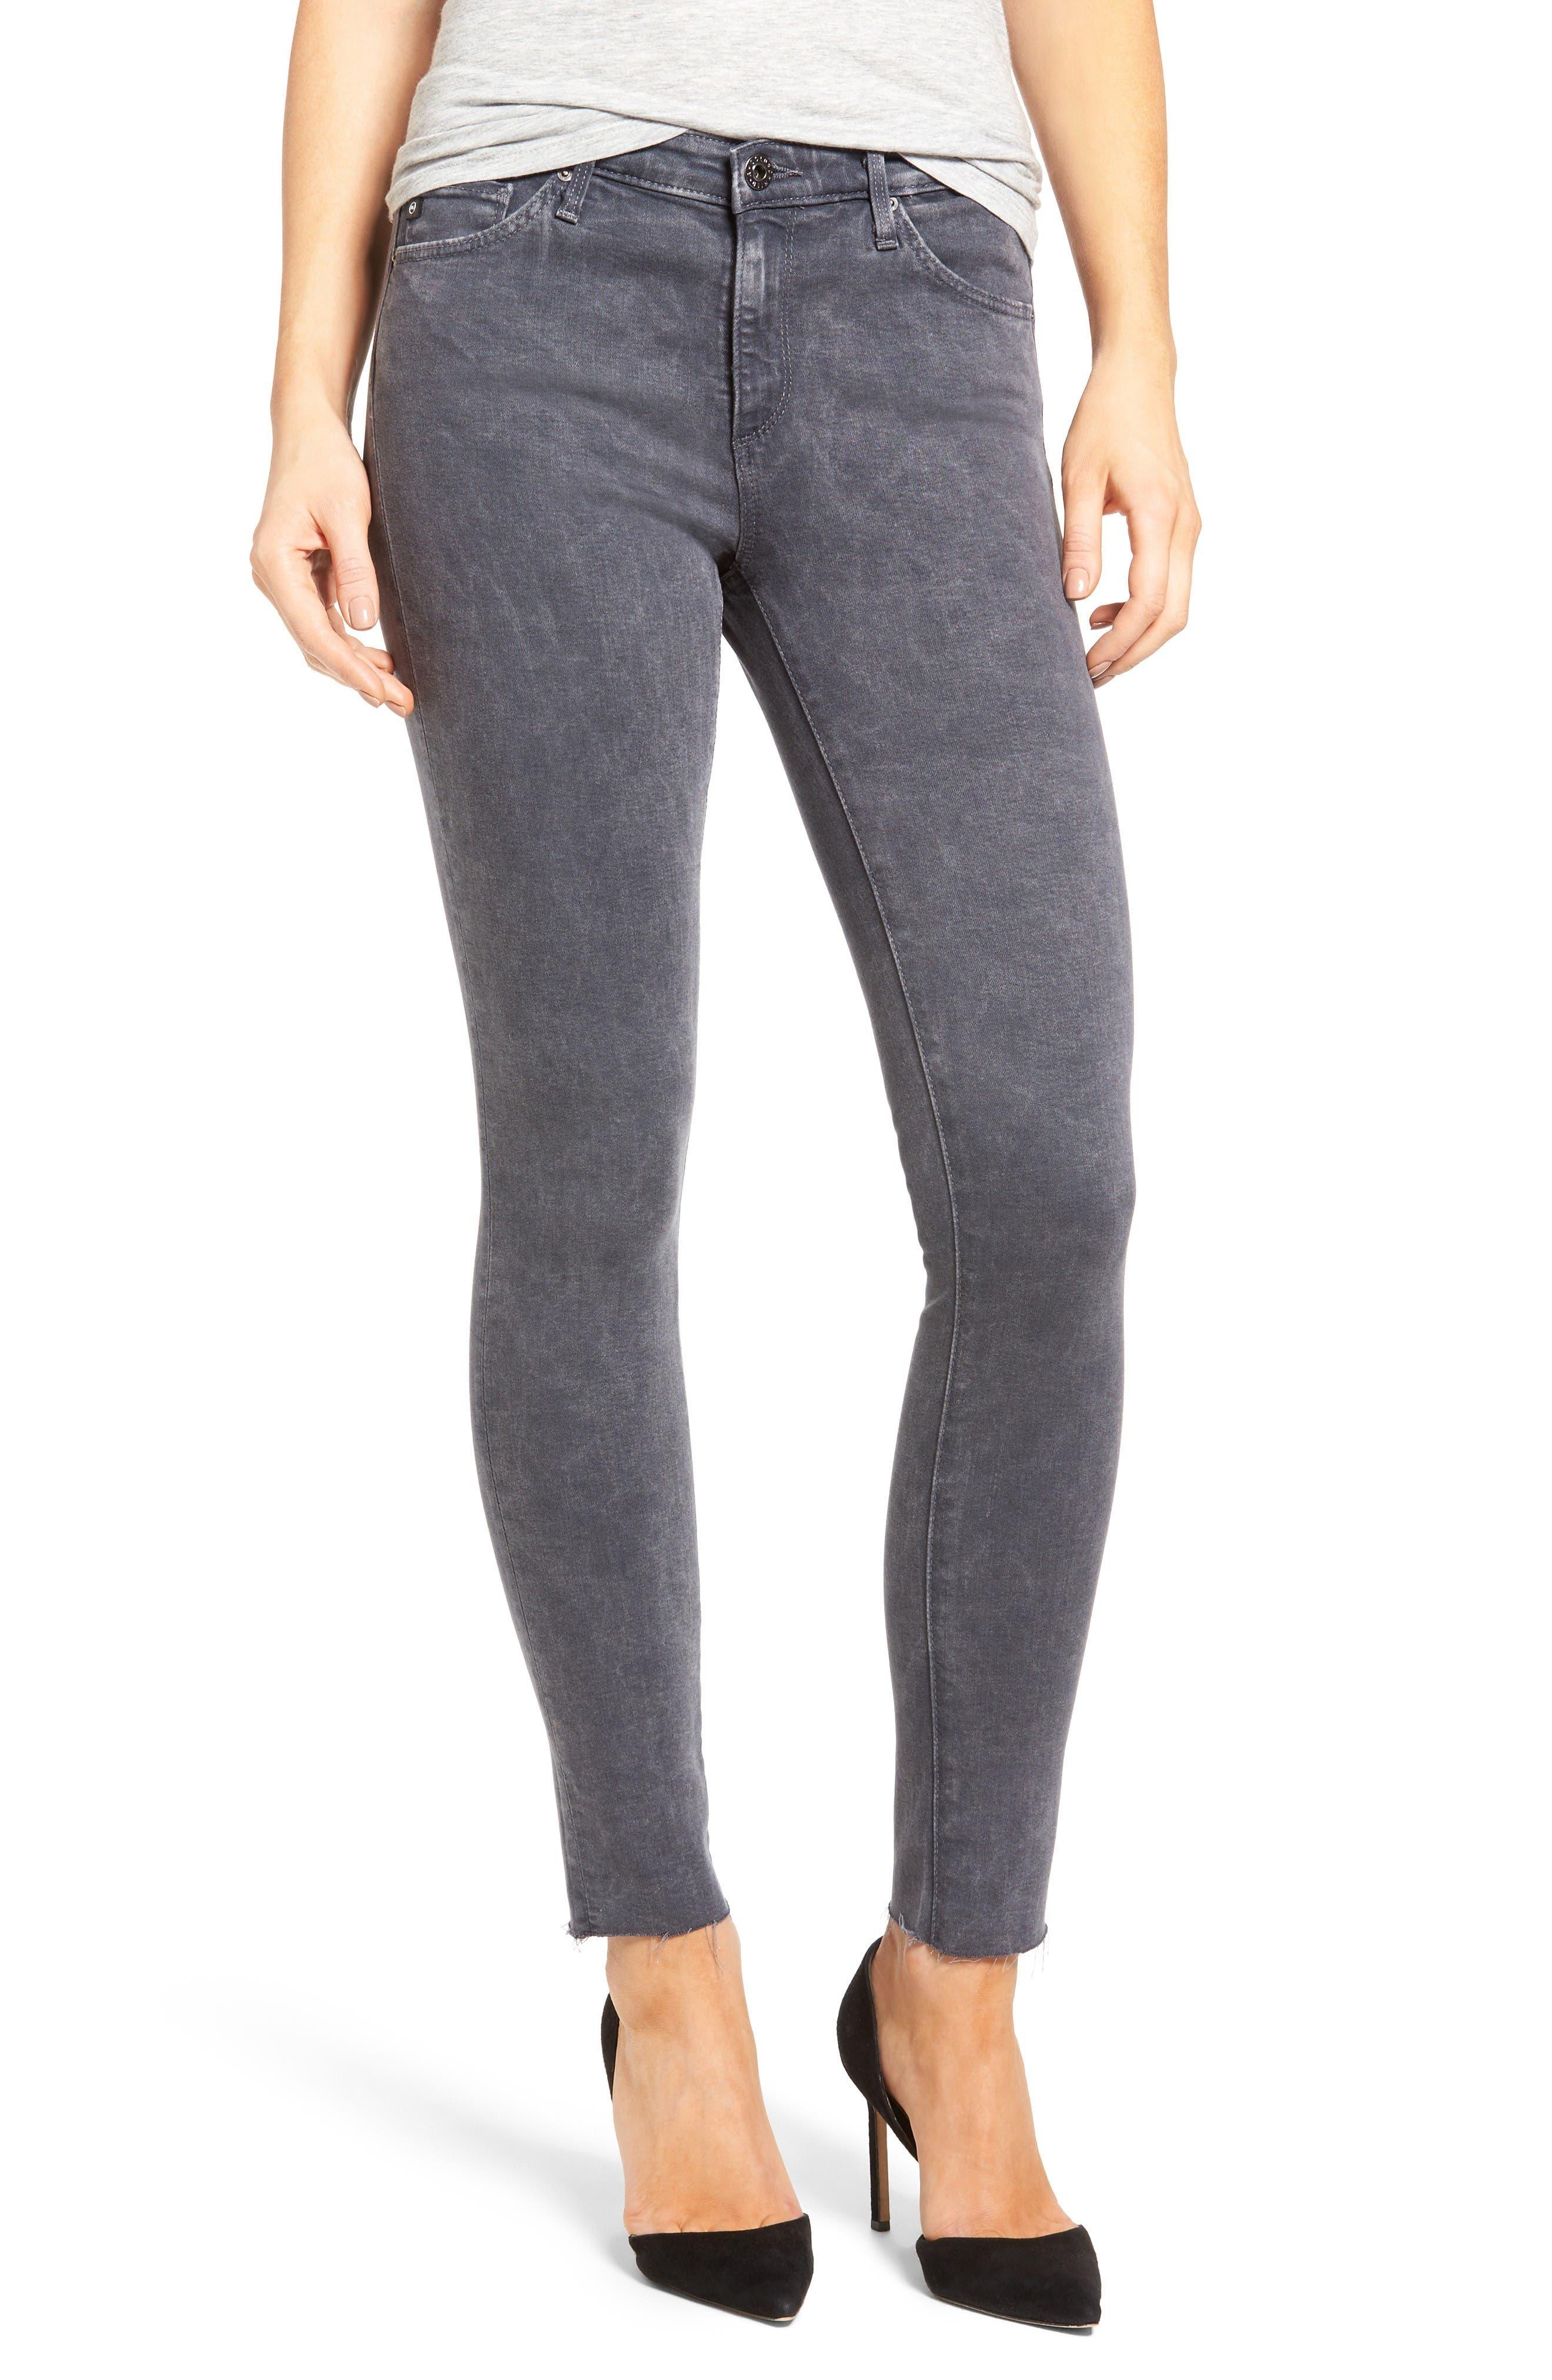 Middi Ankle Skinny Jeans,                         Main,                         color, Erosion